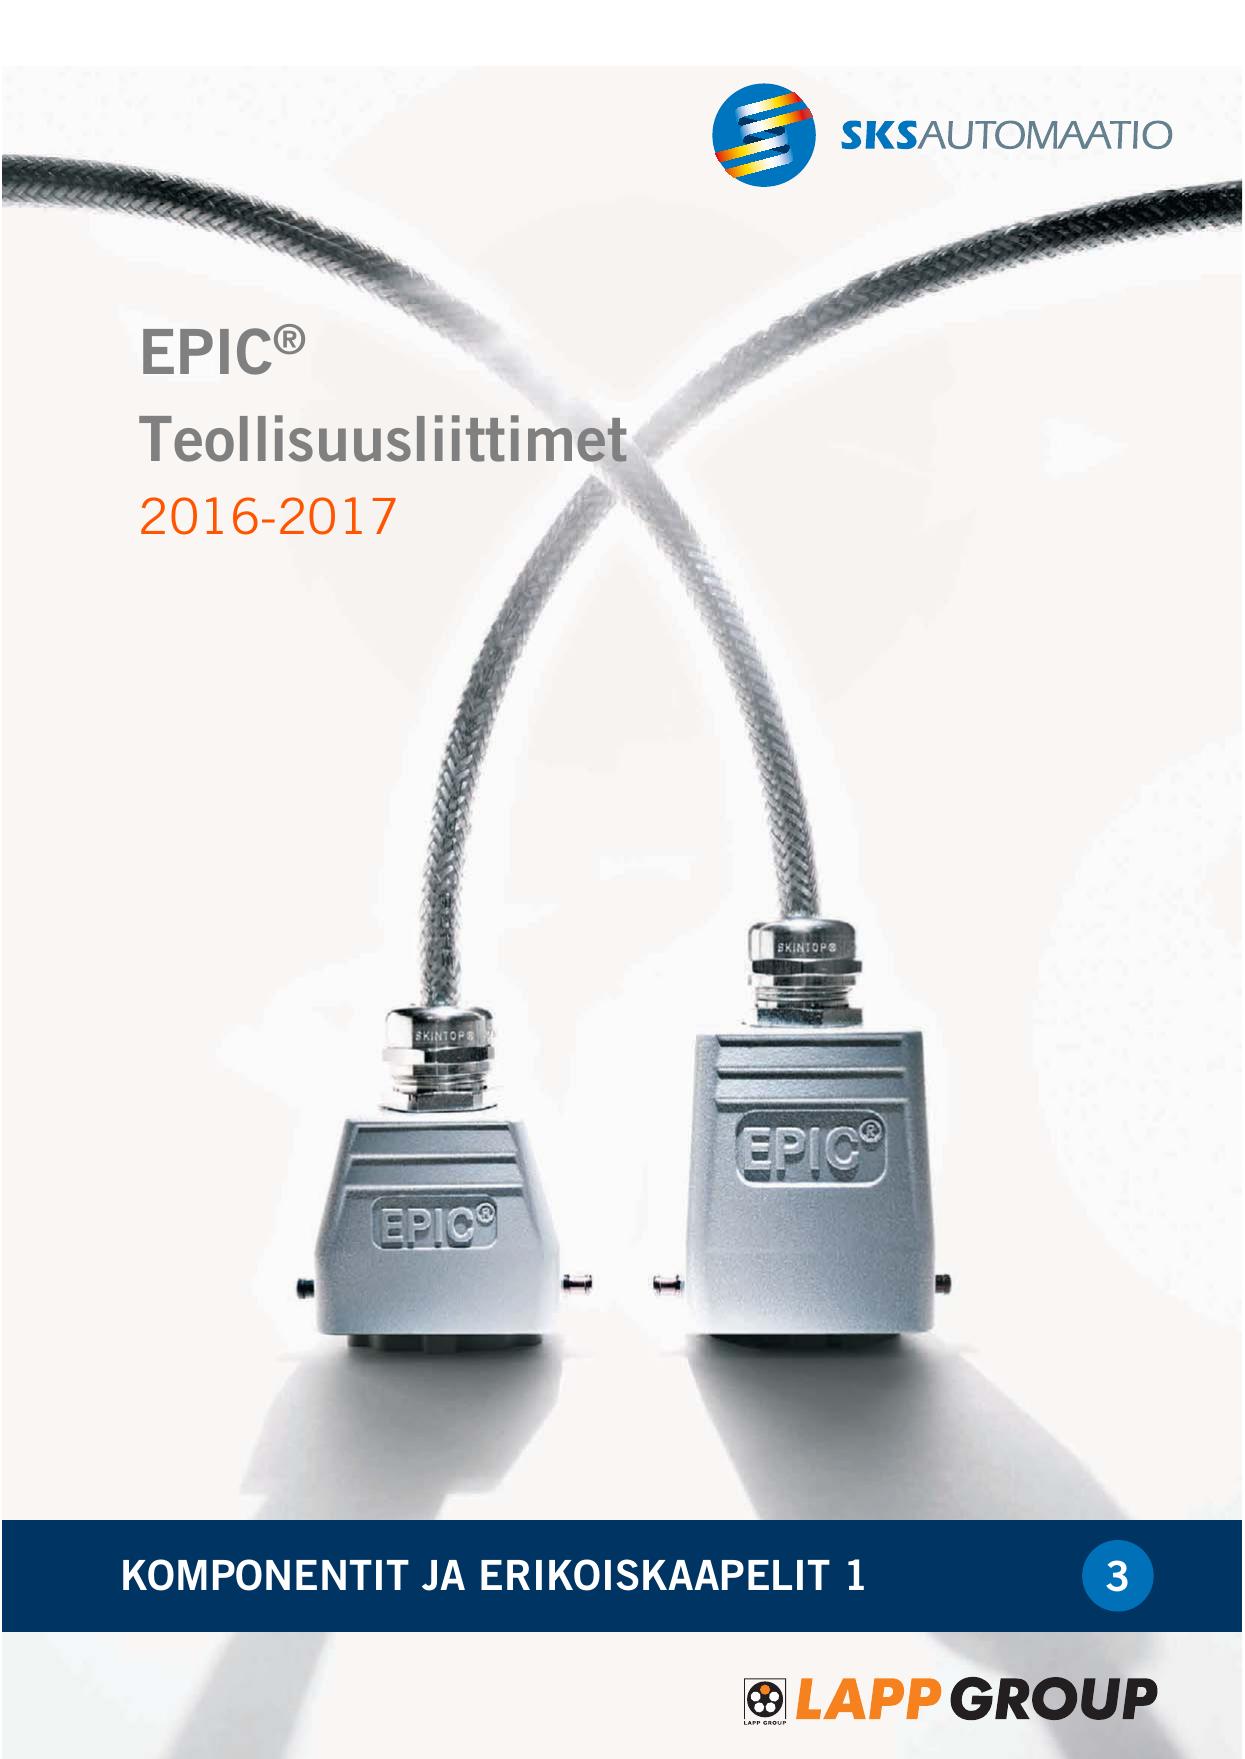 Epic Teollisuusliittimet Rj45 Color Wiring Diagram Besides T568a And T568b Standards